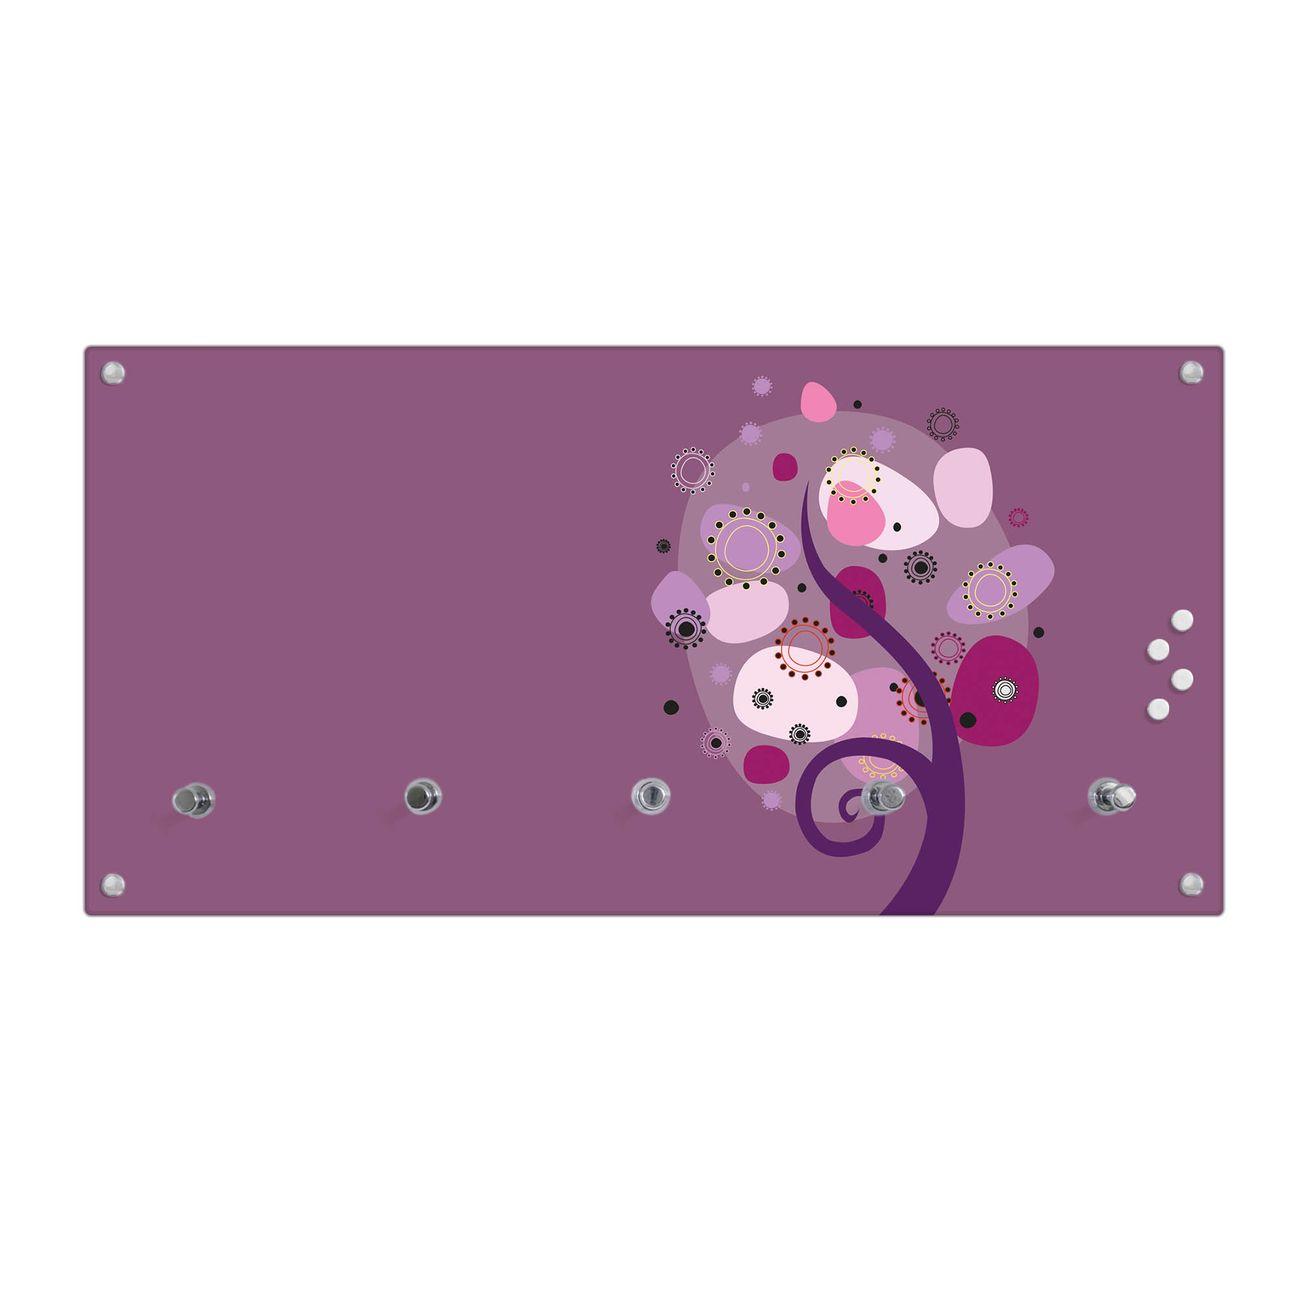 banjado Garderobenpaneele 80x40cm 5 Haken Echtglas Garderobe Violet Element